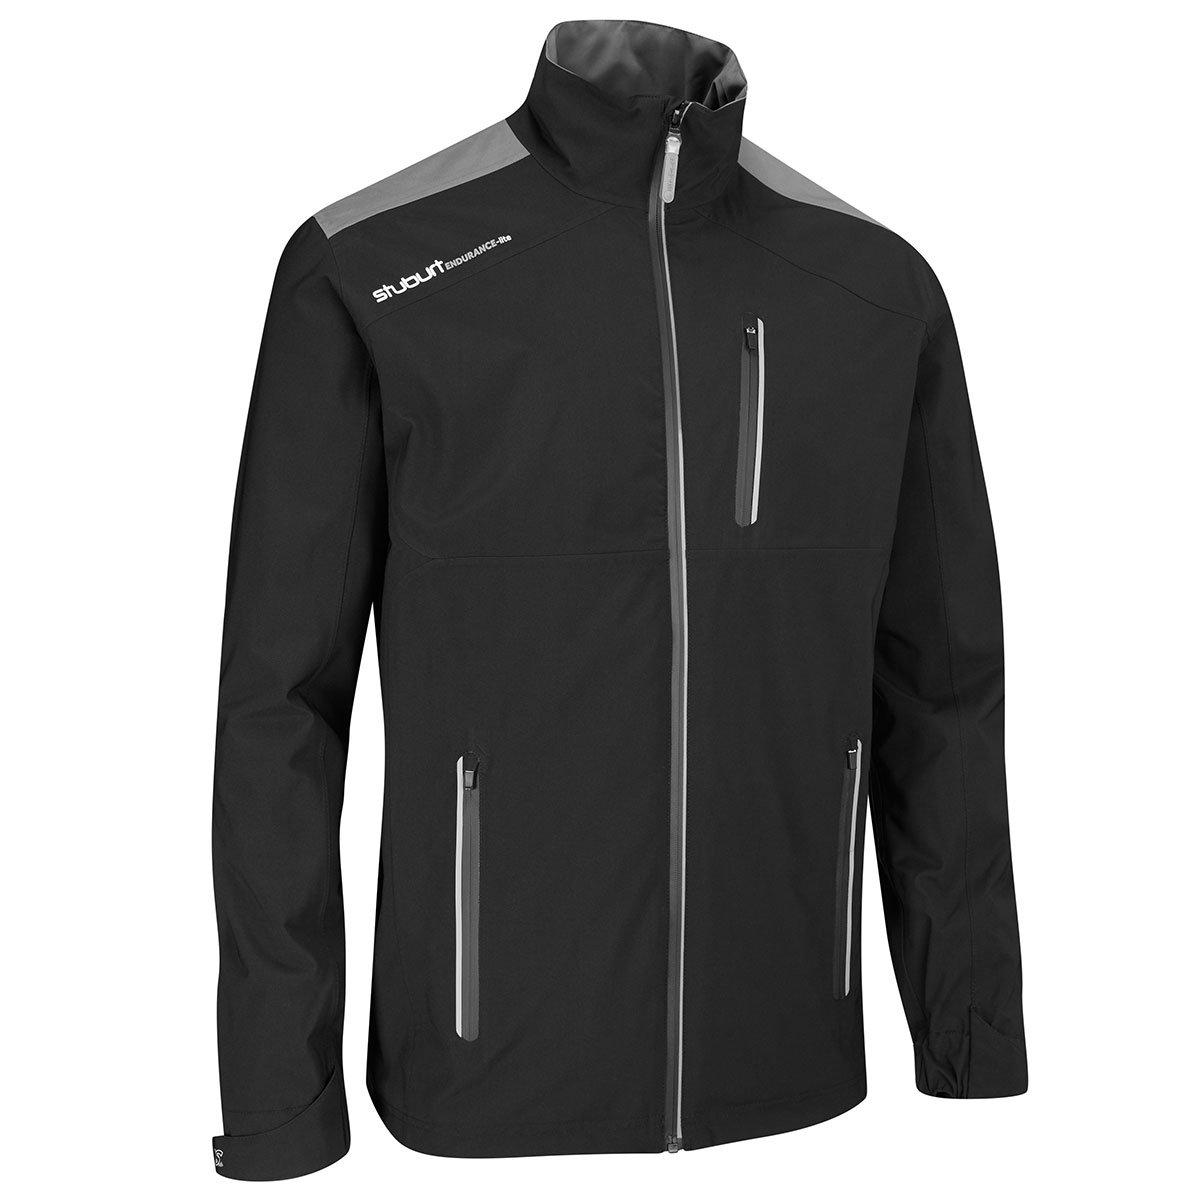 Stuburtゴルフ2017メンズEndurance Lite防水フルZip防風ジャケット B0759WP769 Medium|ブラック ブラック Medium